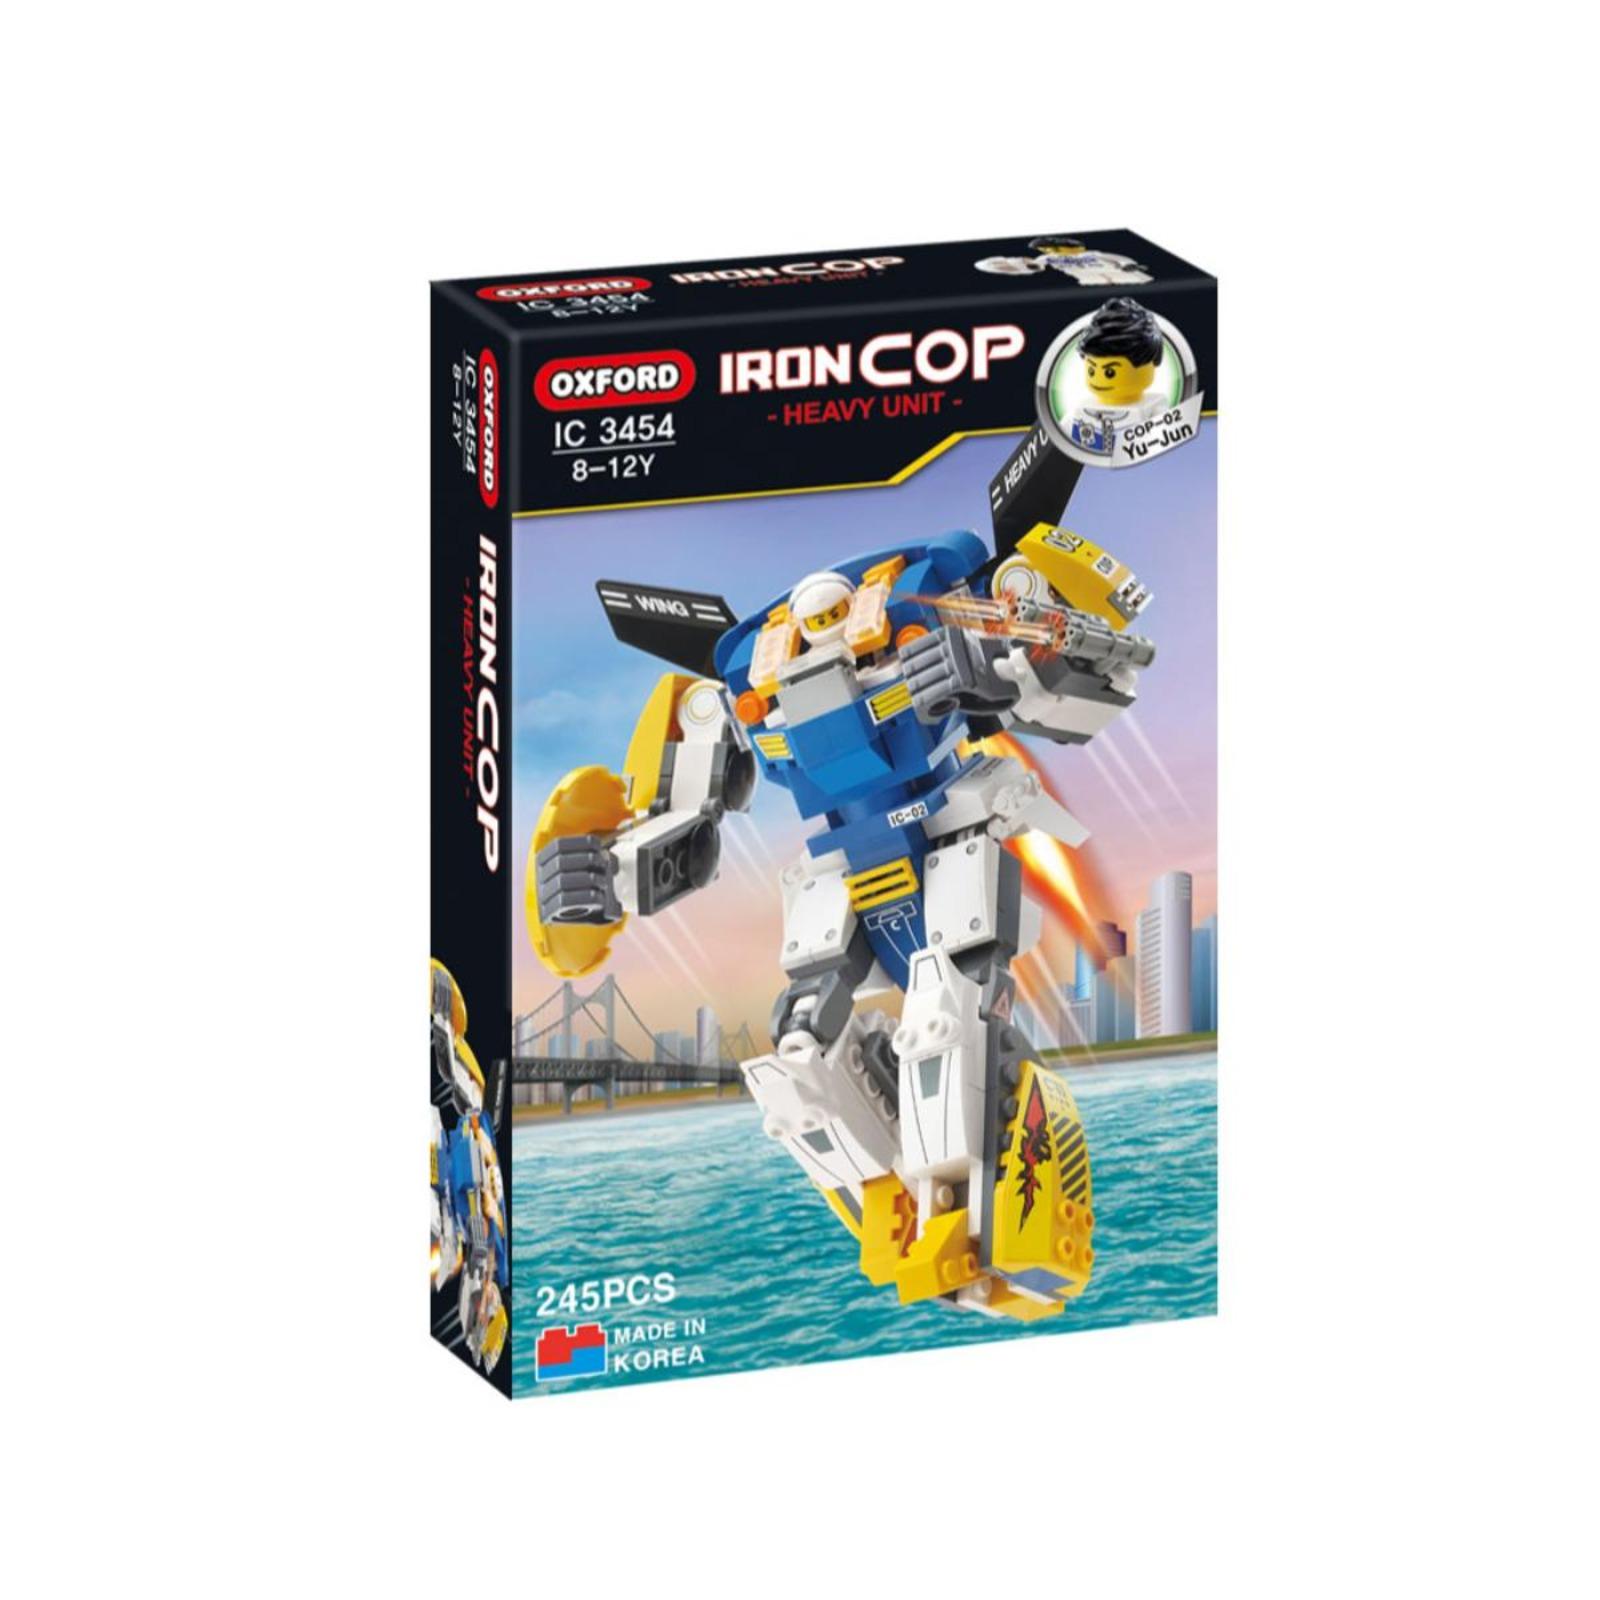 Oxford Toys Iron Cop (Air Robot) (Ic3454)